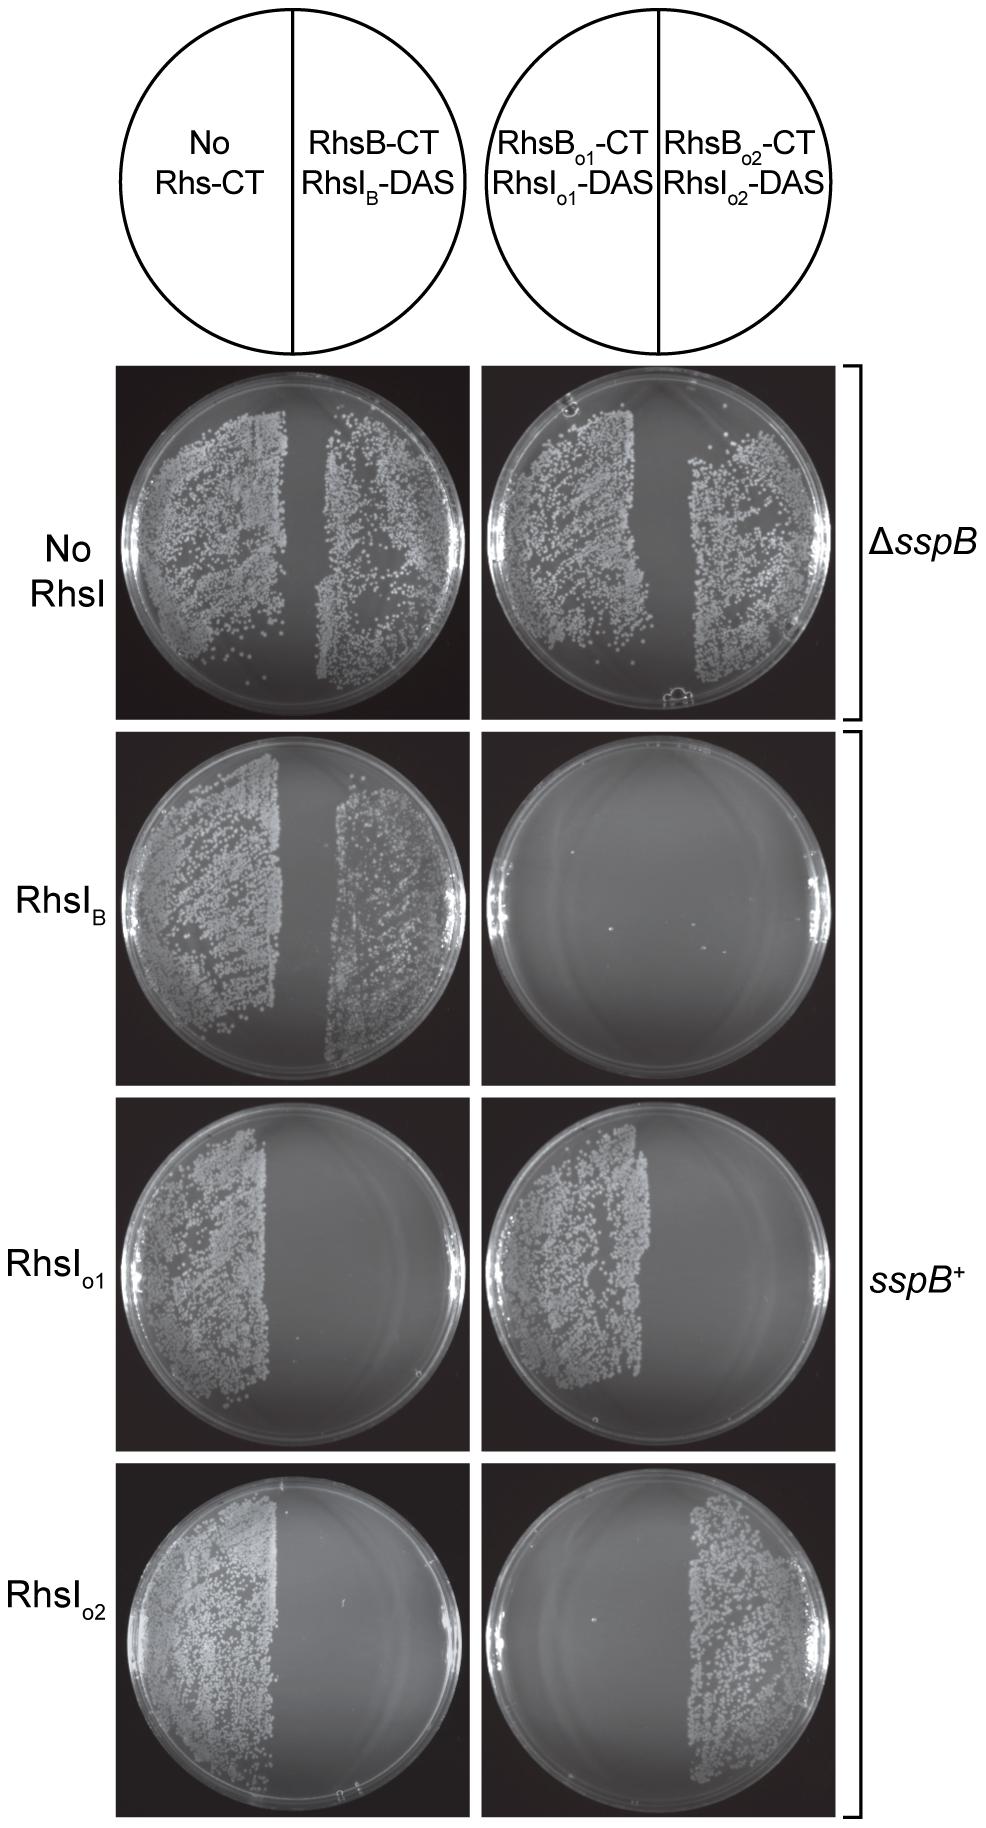 The Rhs genes of <i>D. dadantii</i> 3937 encode toxin/immunity pairs.